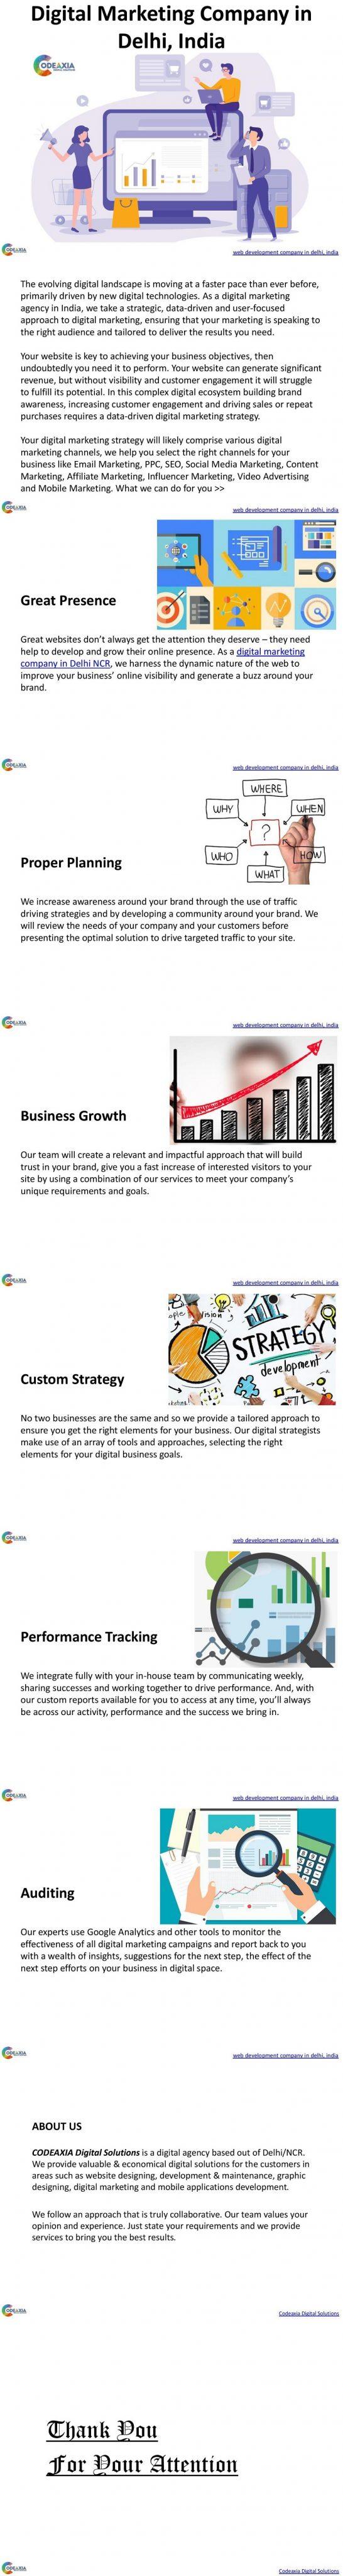 Digital Marketing Company in Delhi, India | Digital Marketing Agency